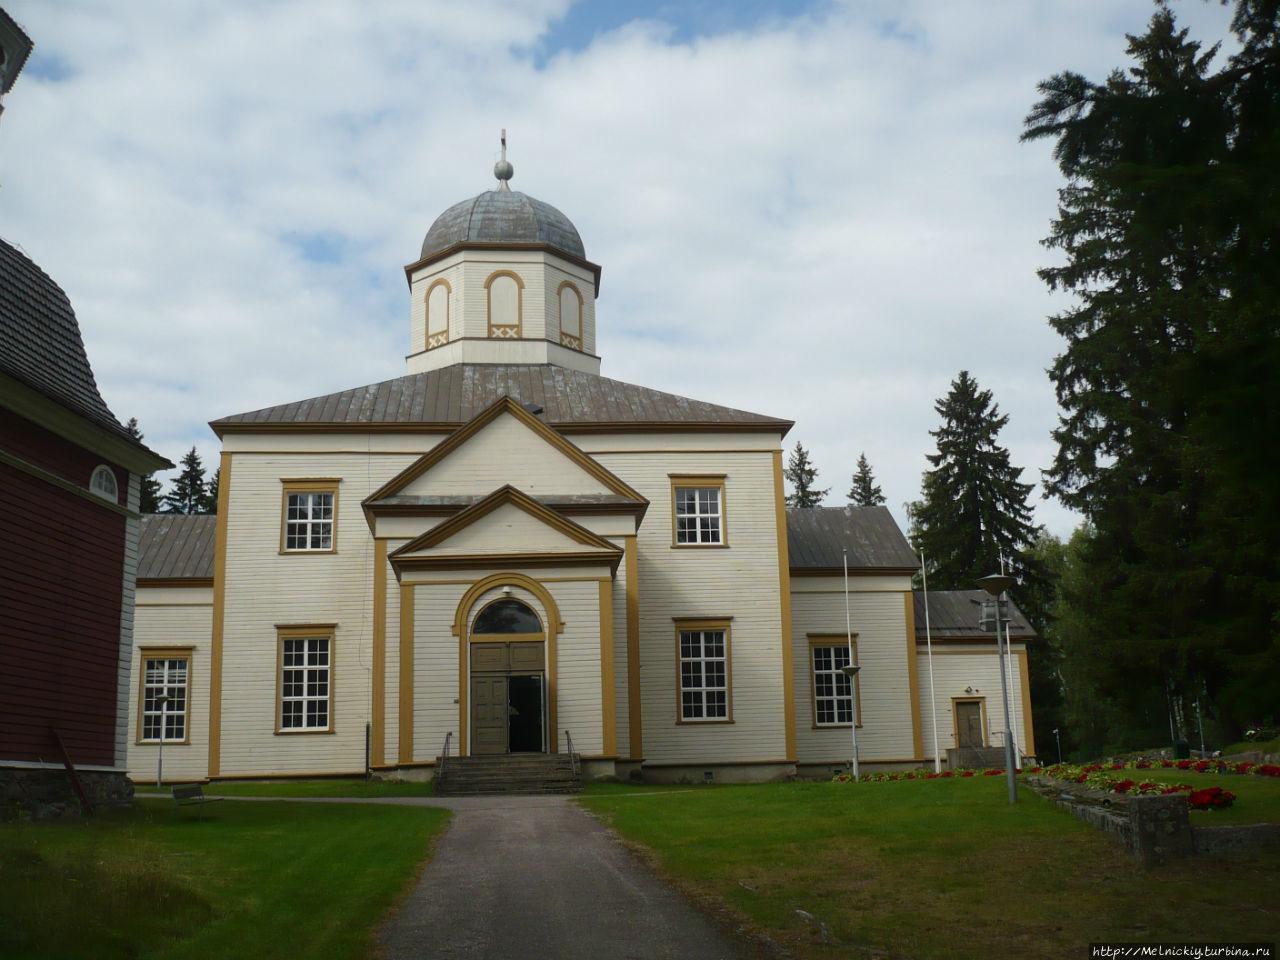 Главная церковь Сулкавы Сулкава, Финляндия